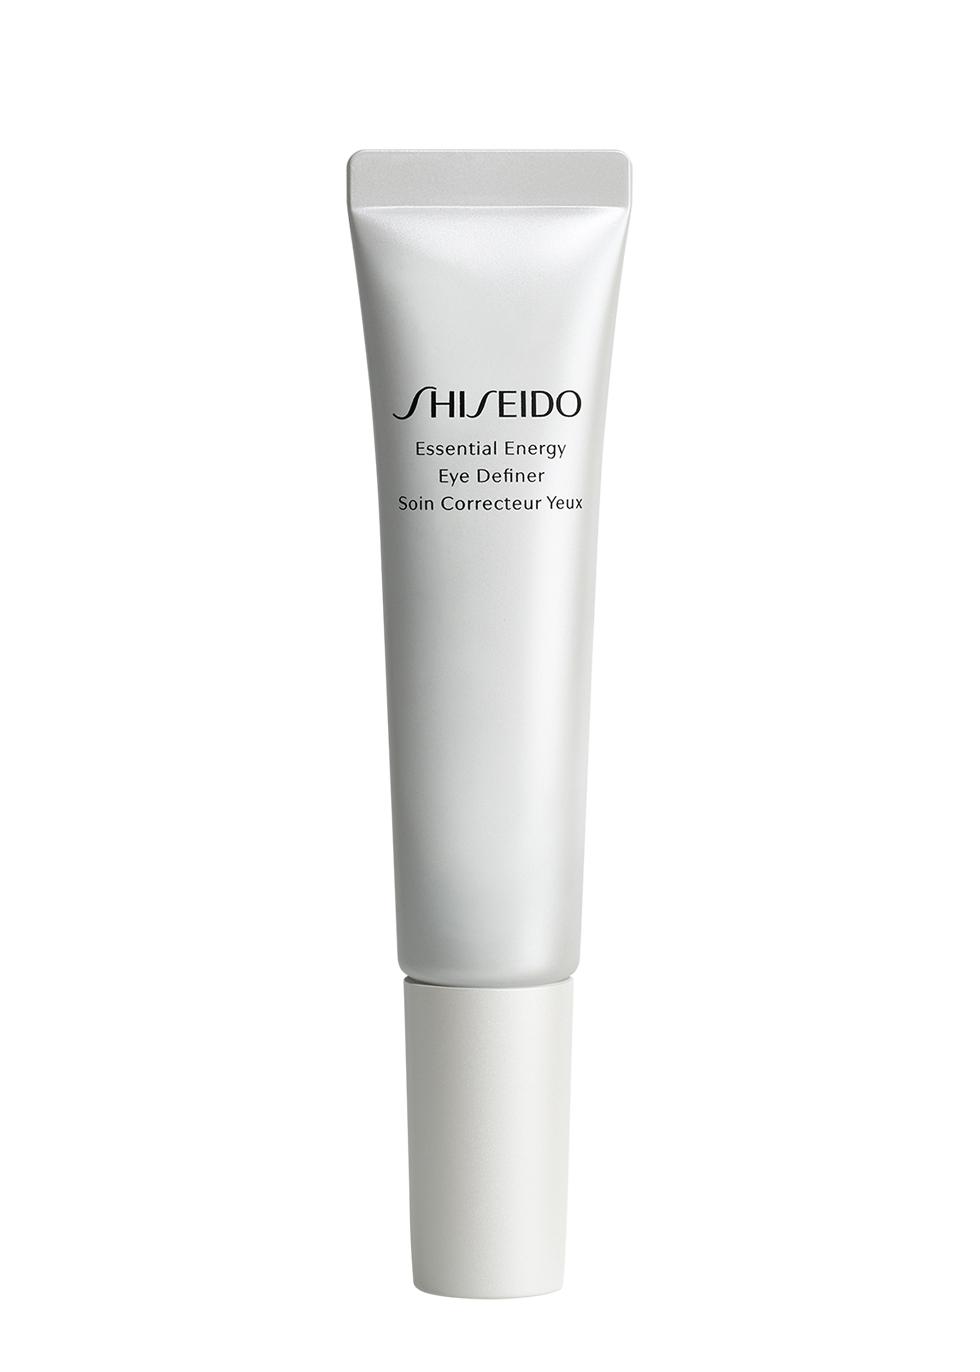 Essential Energy Eye Definer 15ml - SHISEIDO